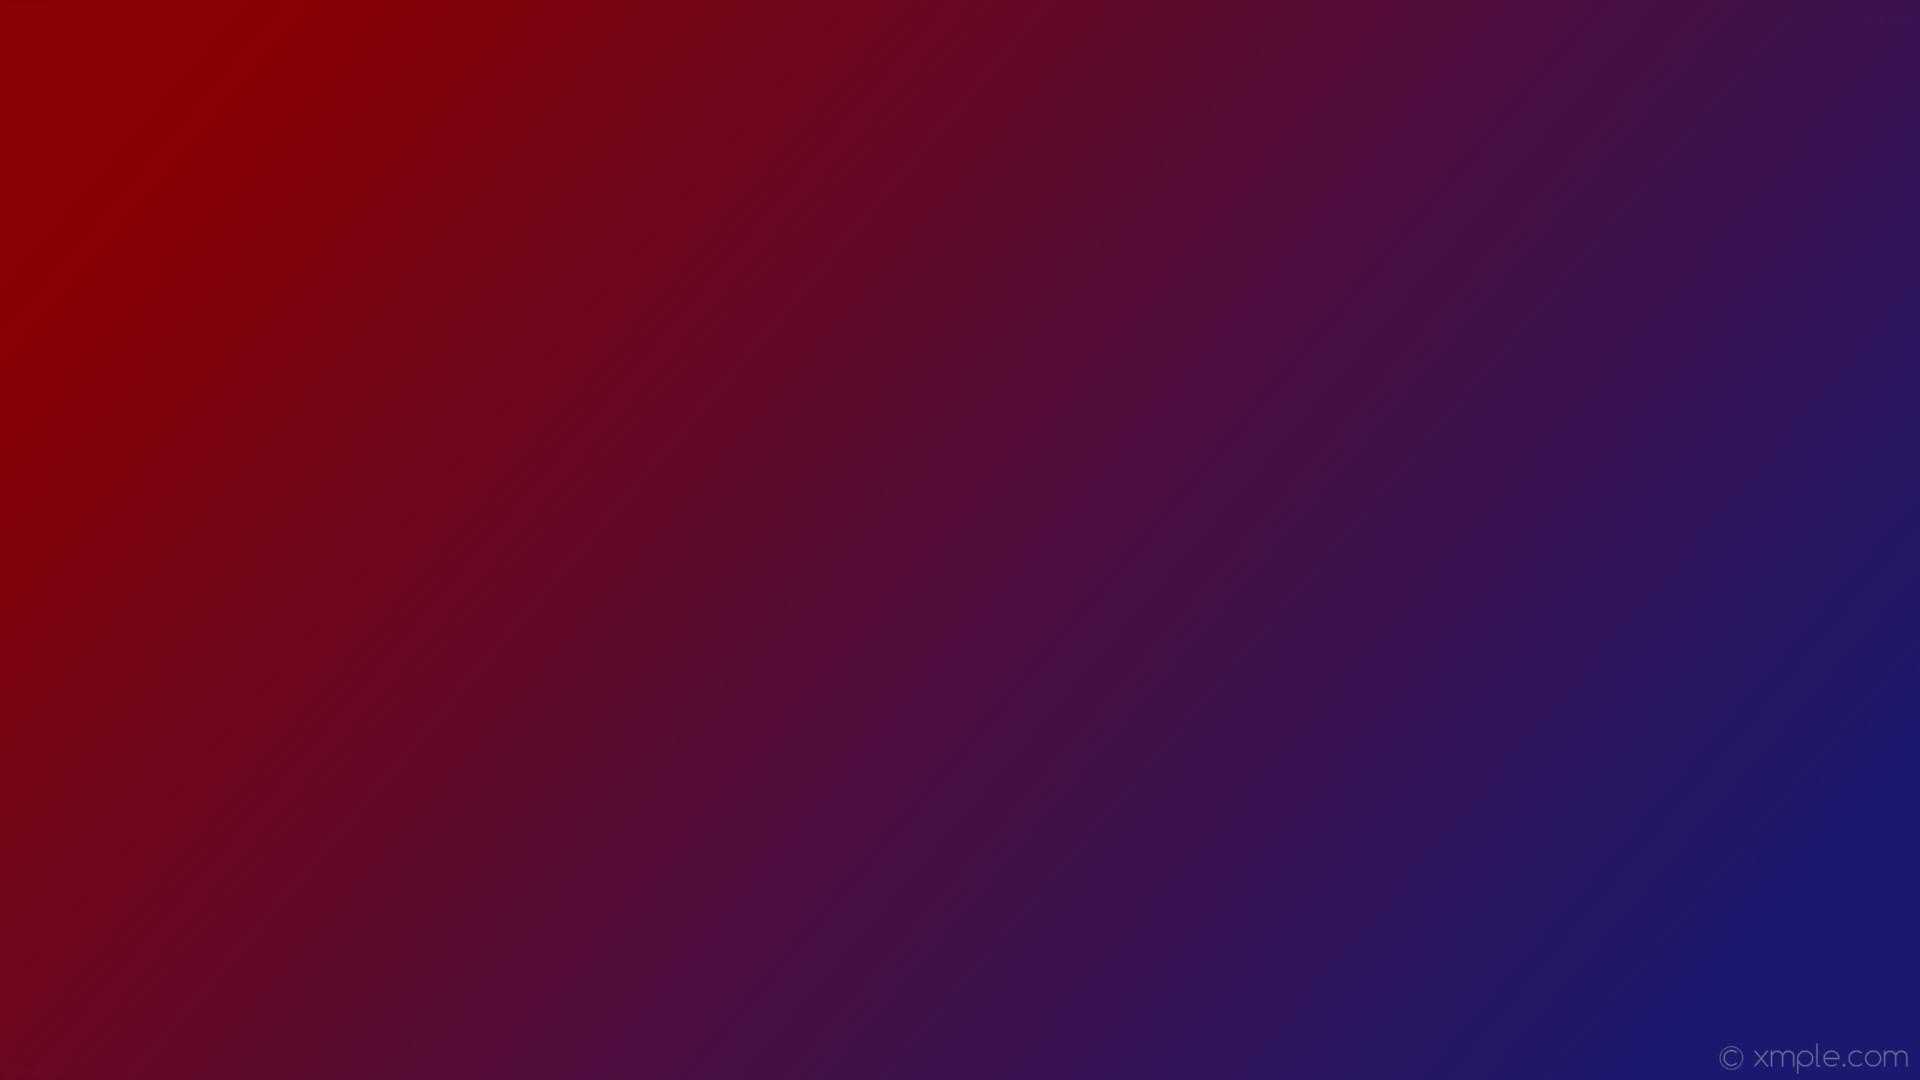 wallpaper gradient red blue linear midnight blue dark red #191970 #8b0000  345°